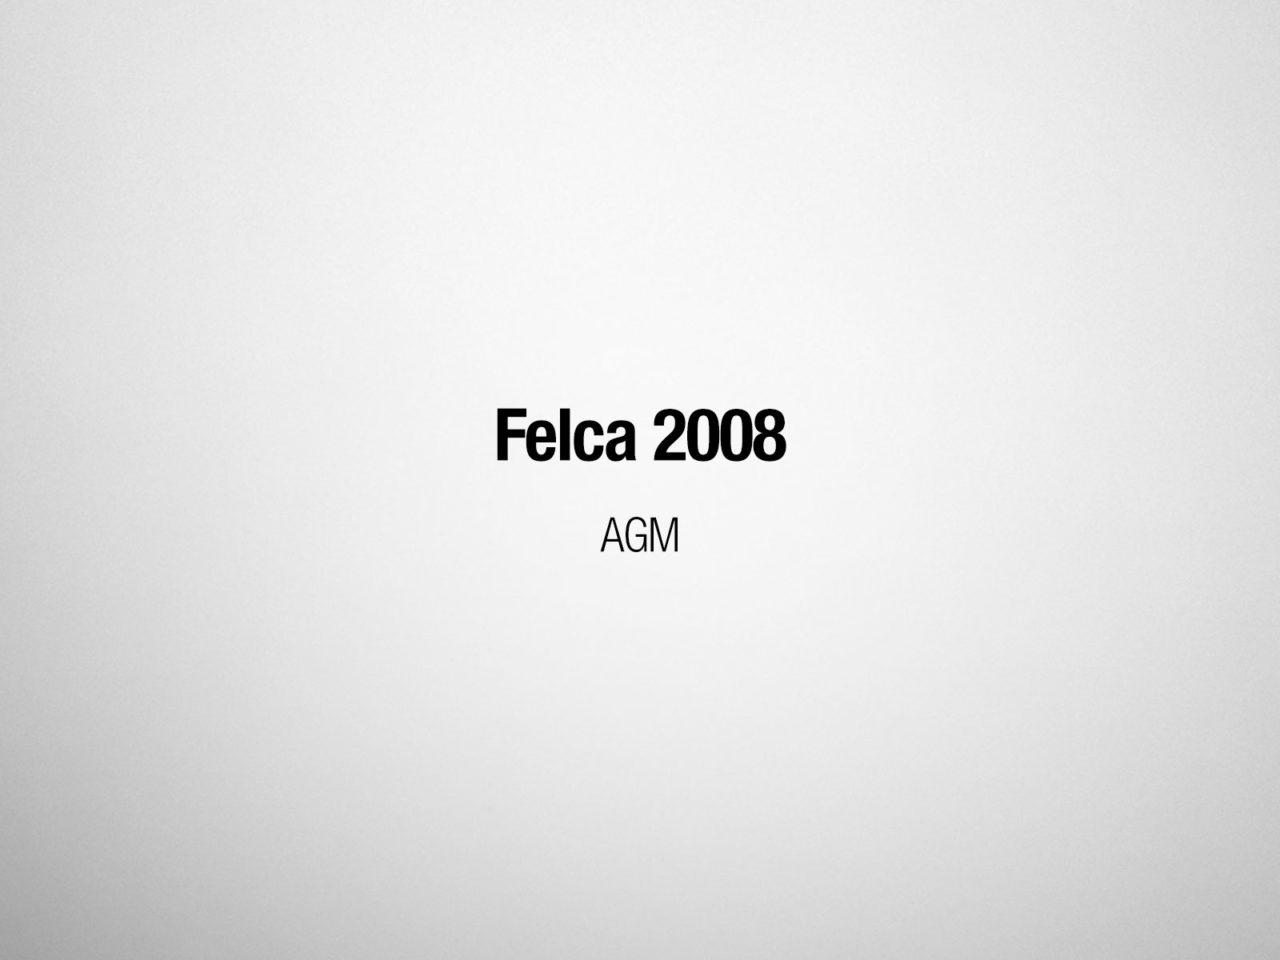 Felca 2008 AGM